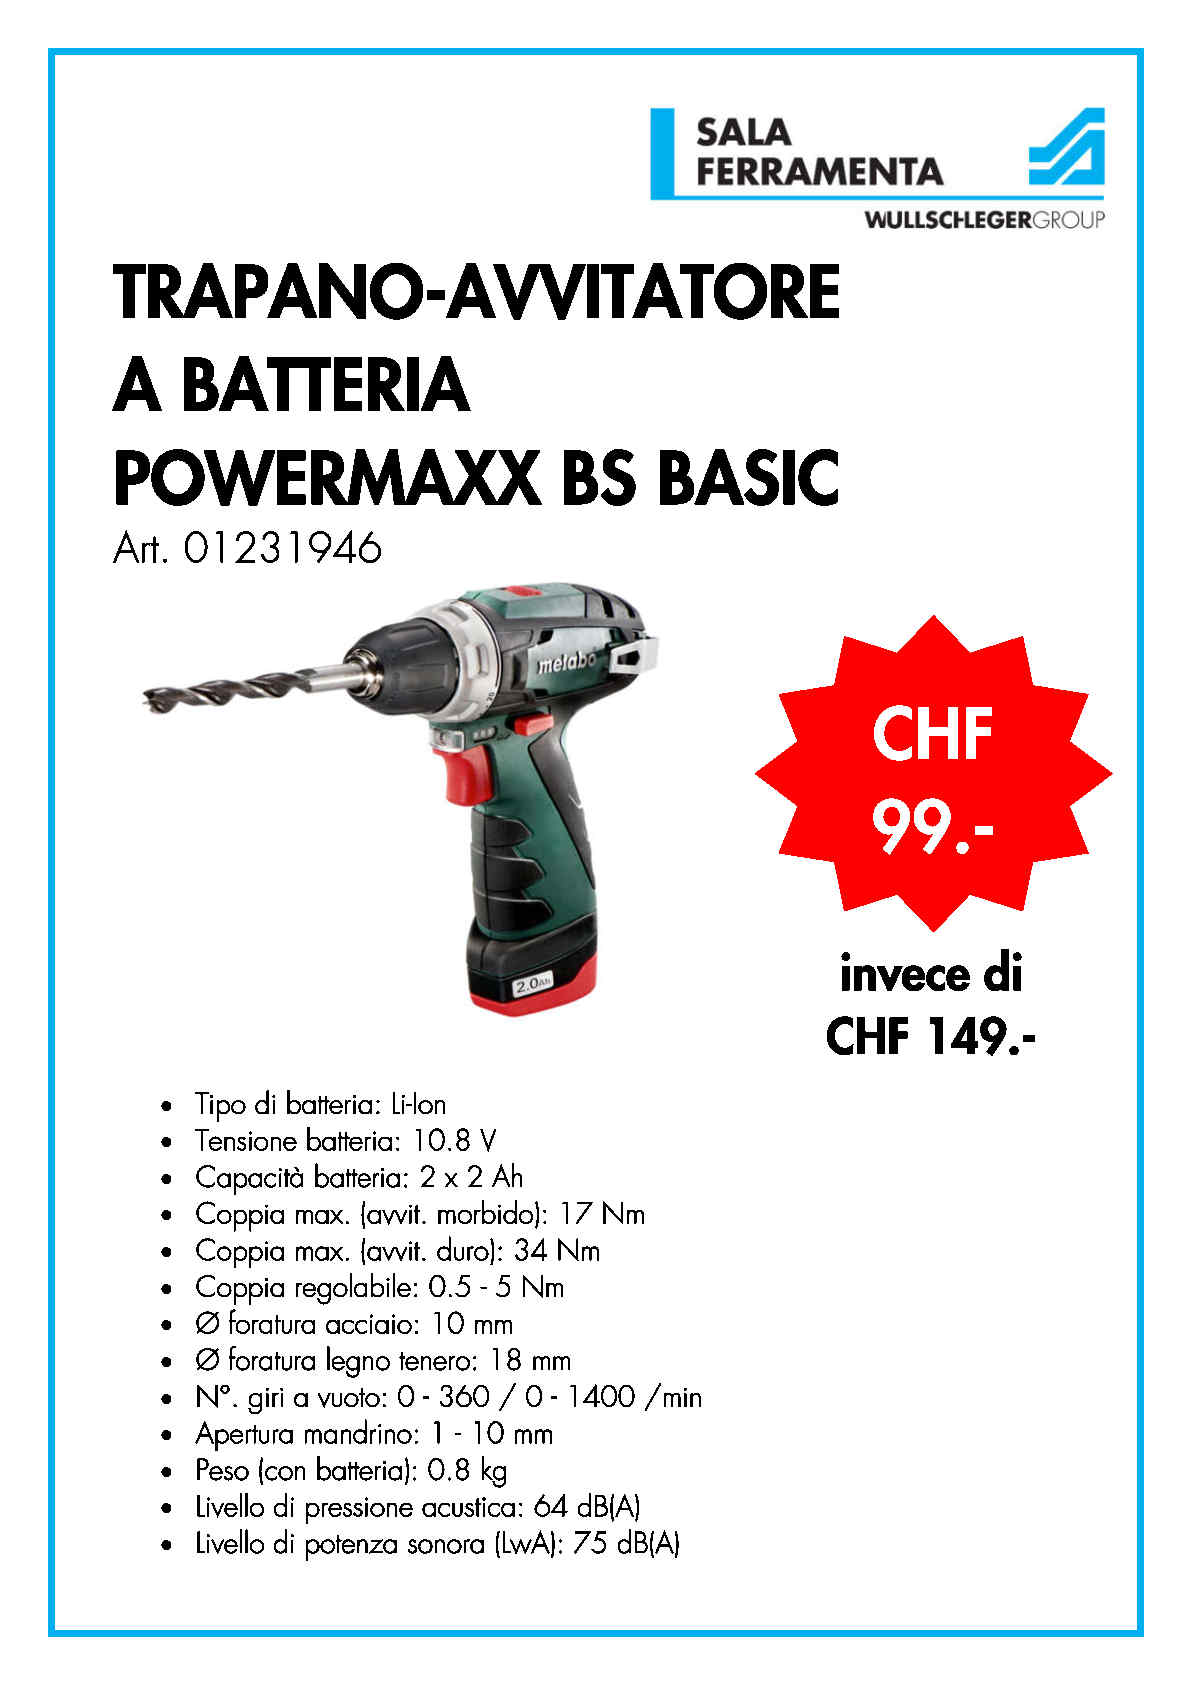 TRAPANO-AVVITATORE A BATTERIA POWERMAXX BS BASIC